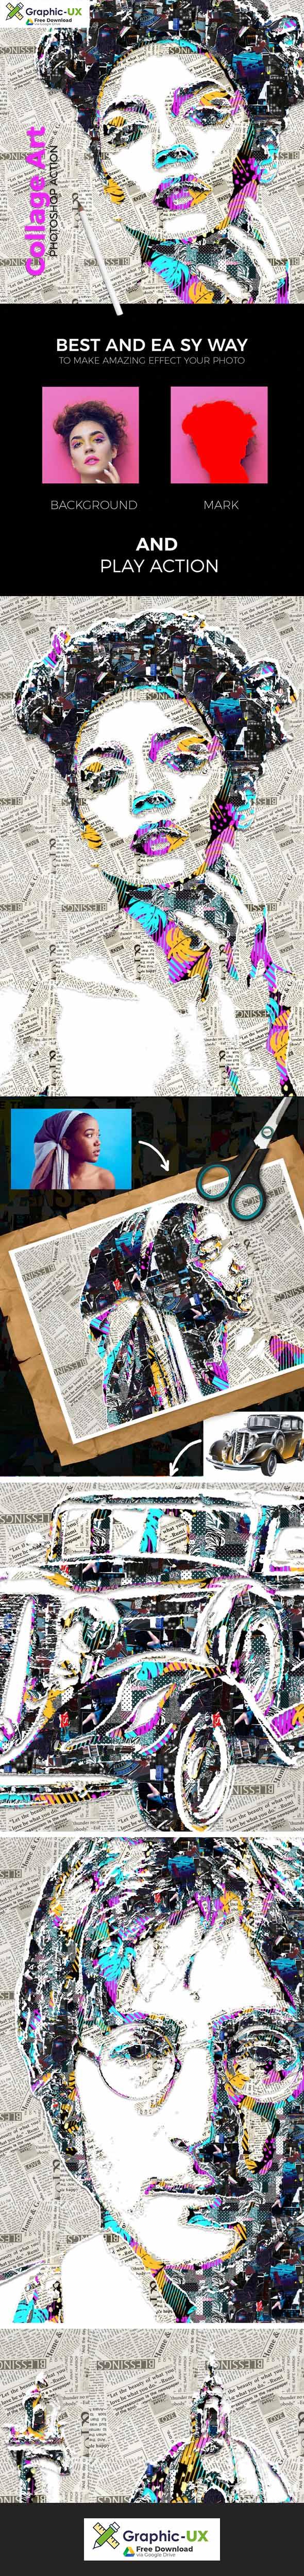 Collage Art Photoshop Action